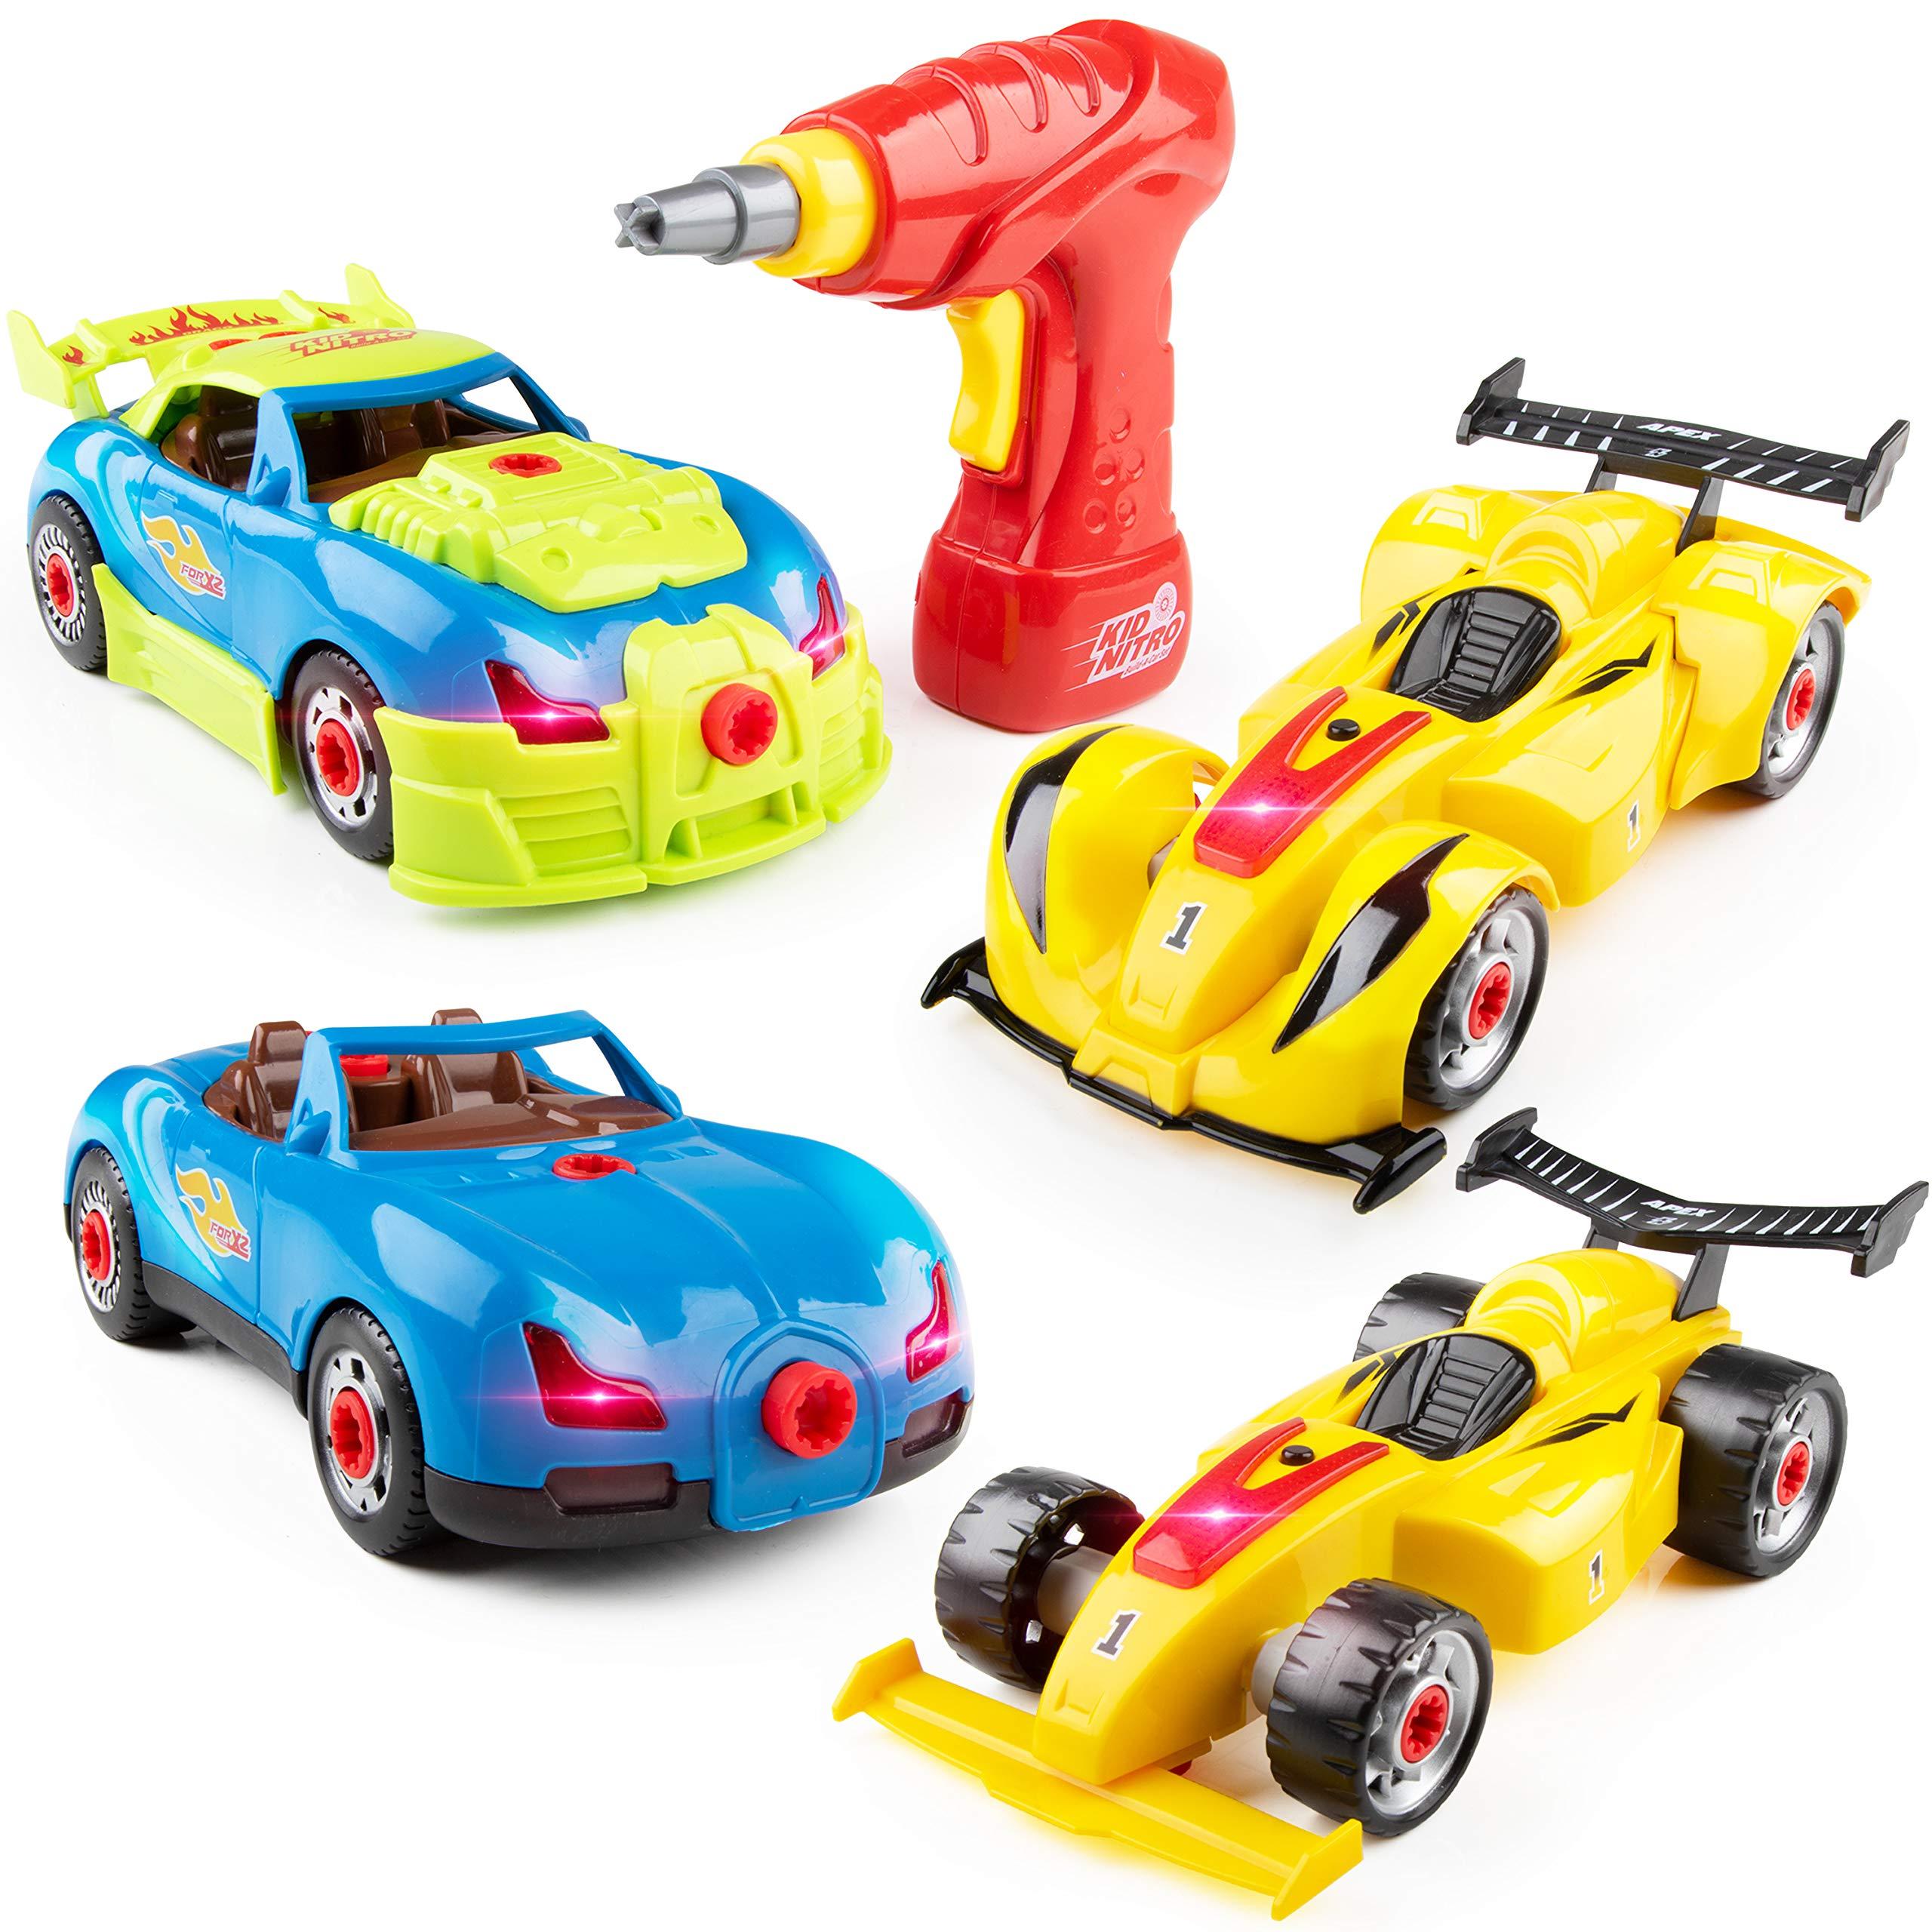 USA Toyz Race Car Take Apart Toys - 52pk Build a Car STEM Building Toys Set, Take Apart Car Building Kits for Kids w/ Car Drill Tool for Boys or Girls by USA Toyz